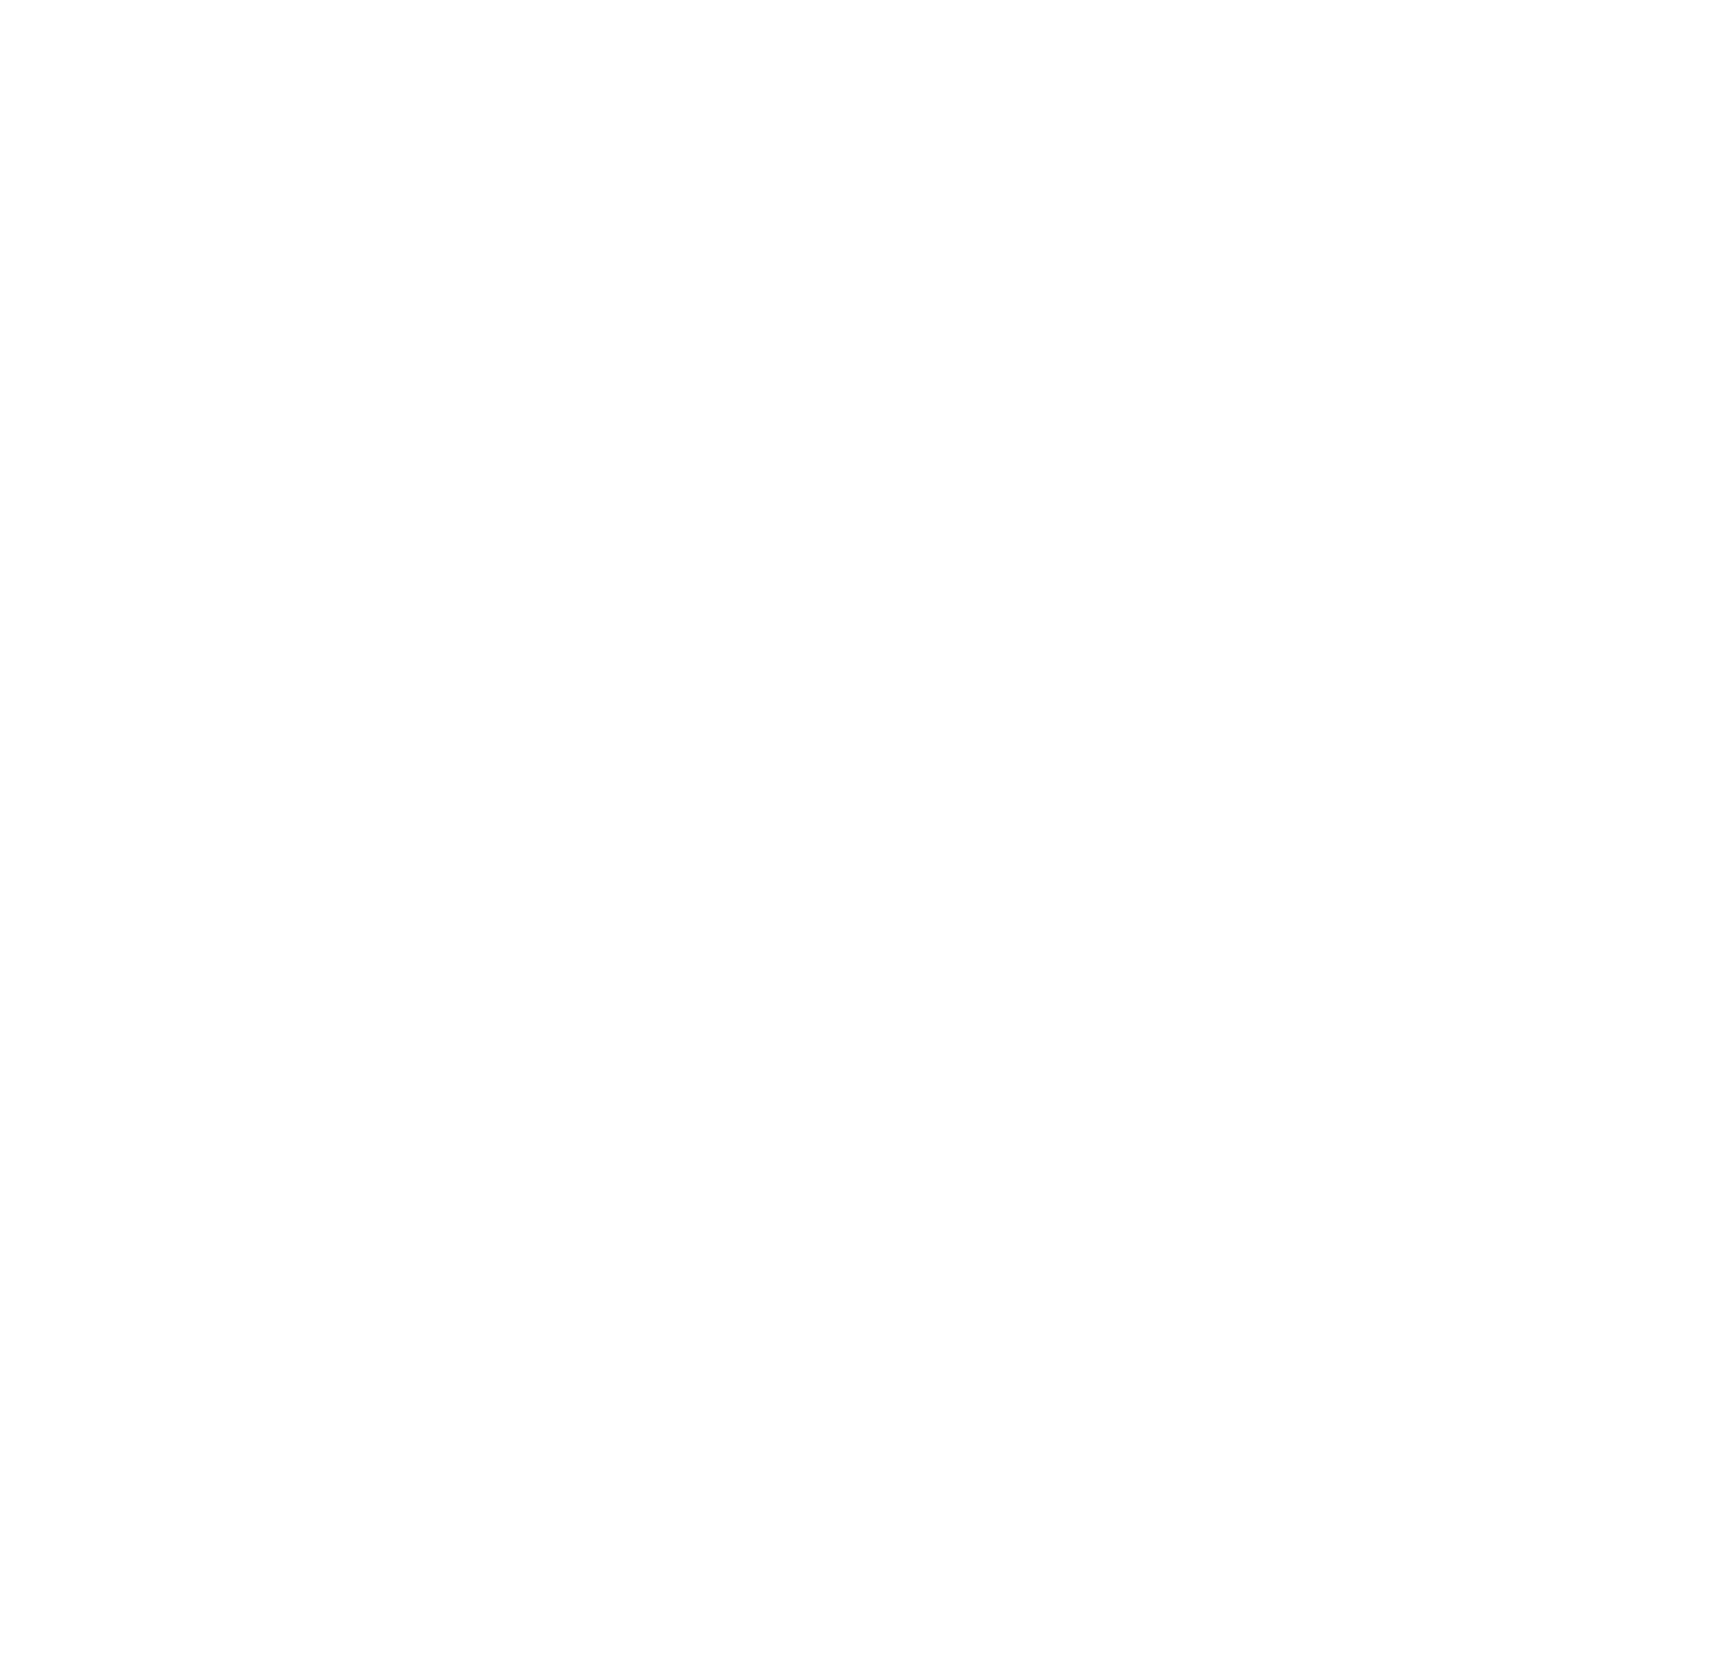 9-11 Illustration